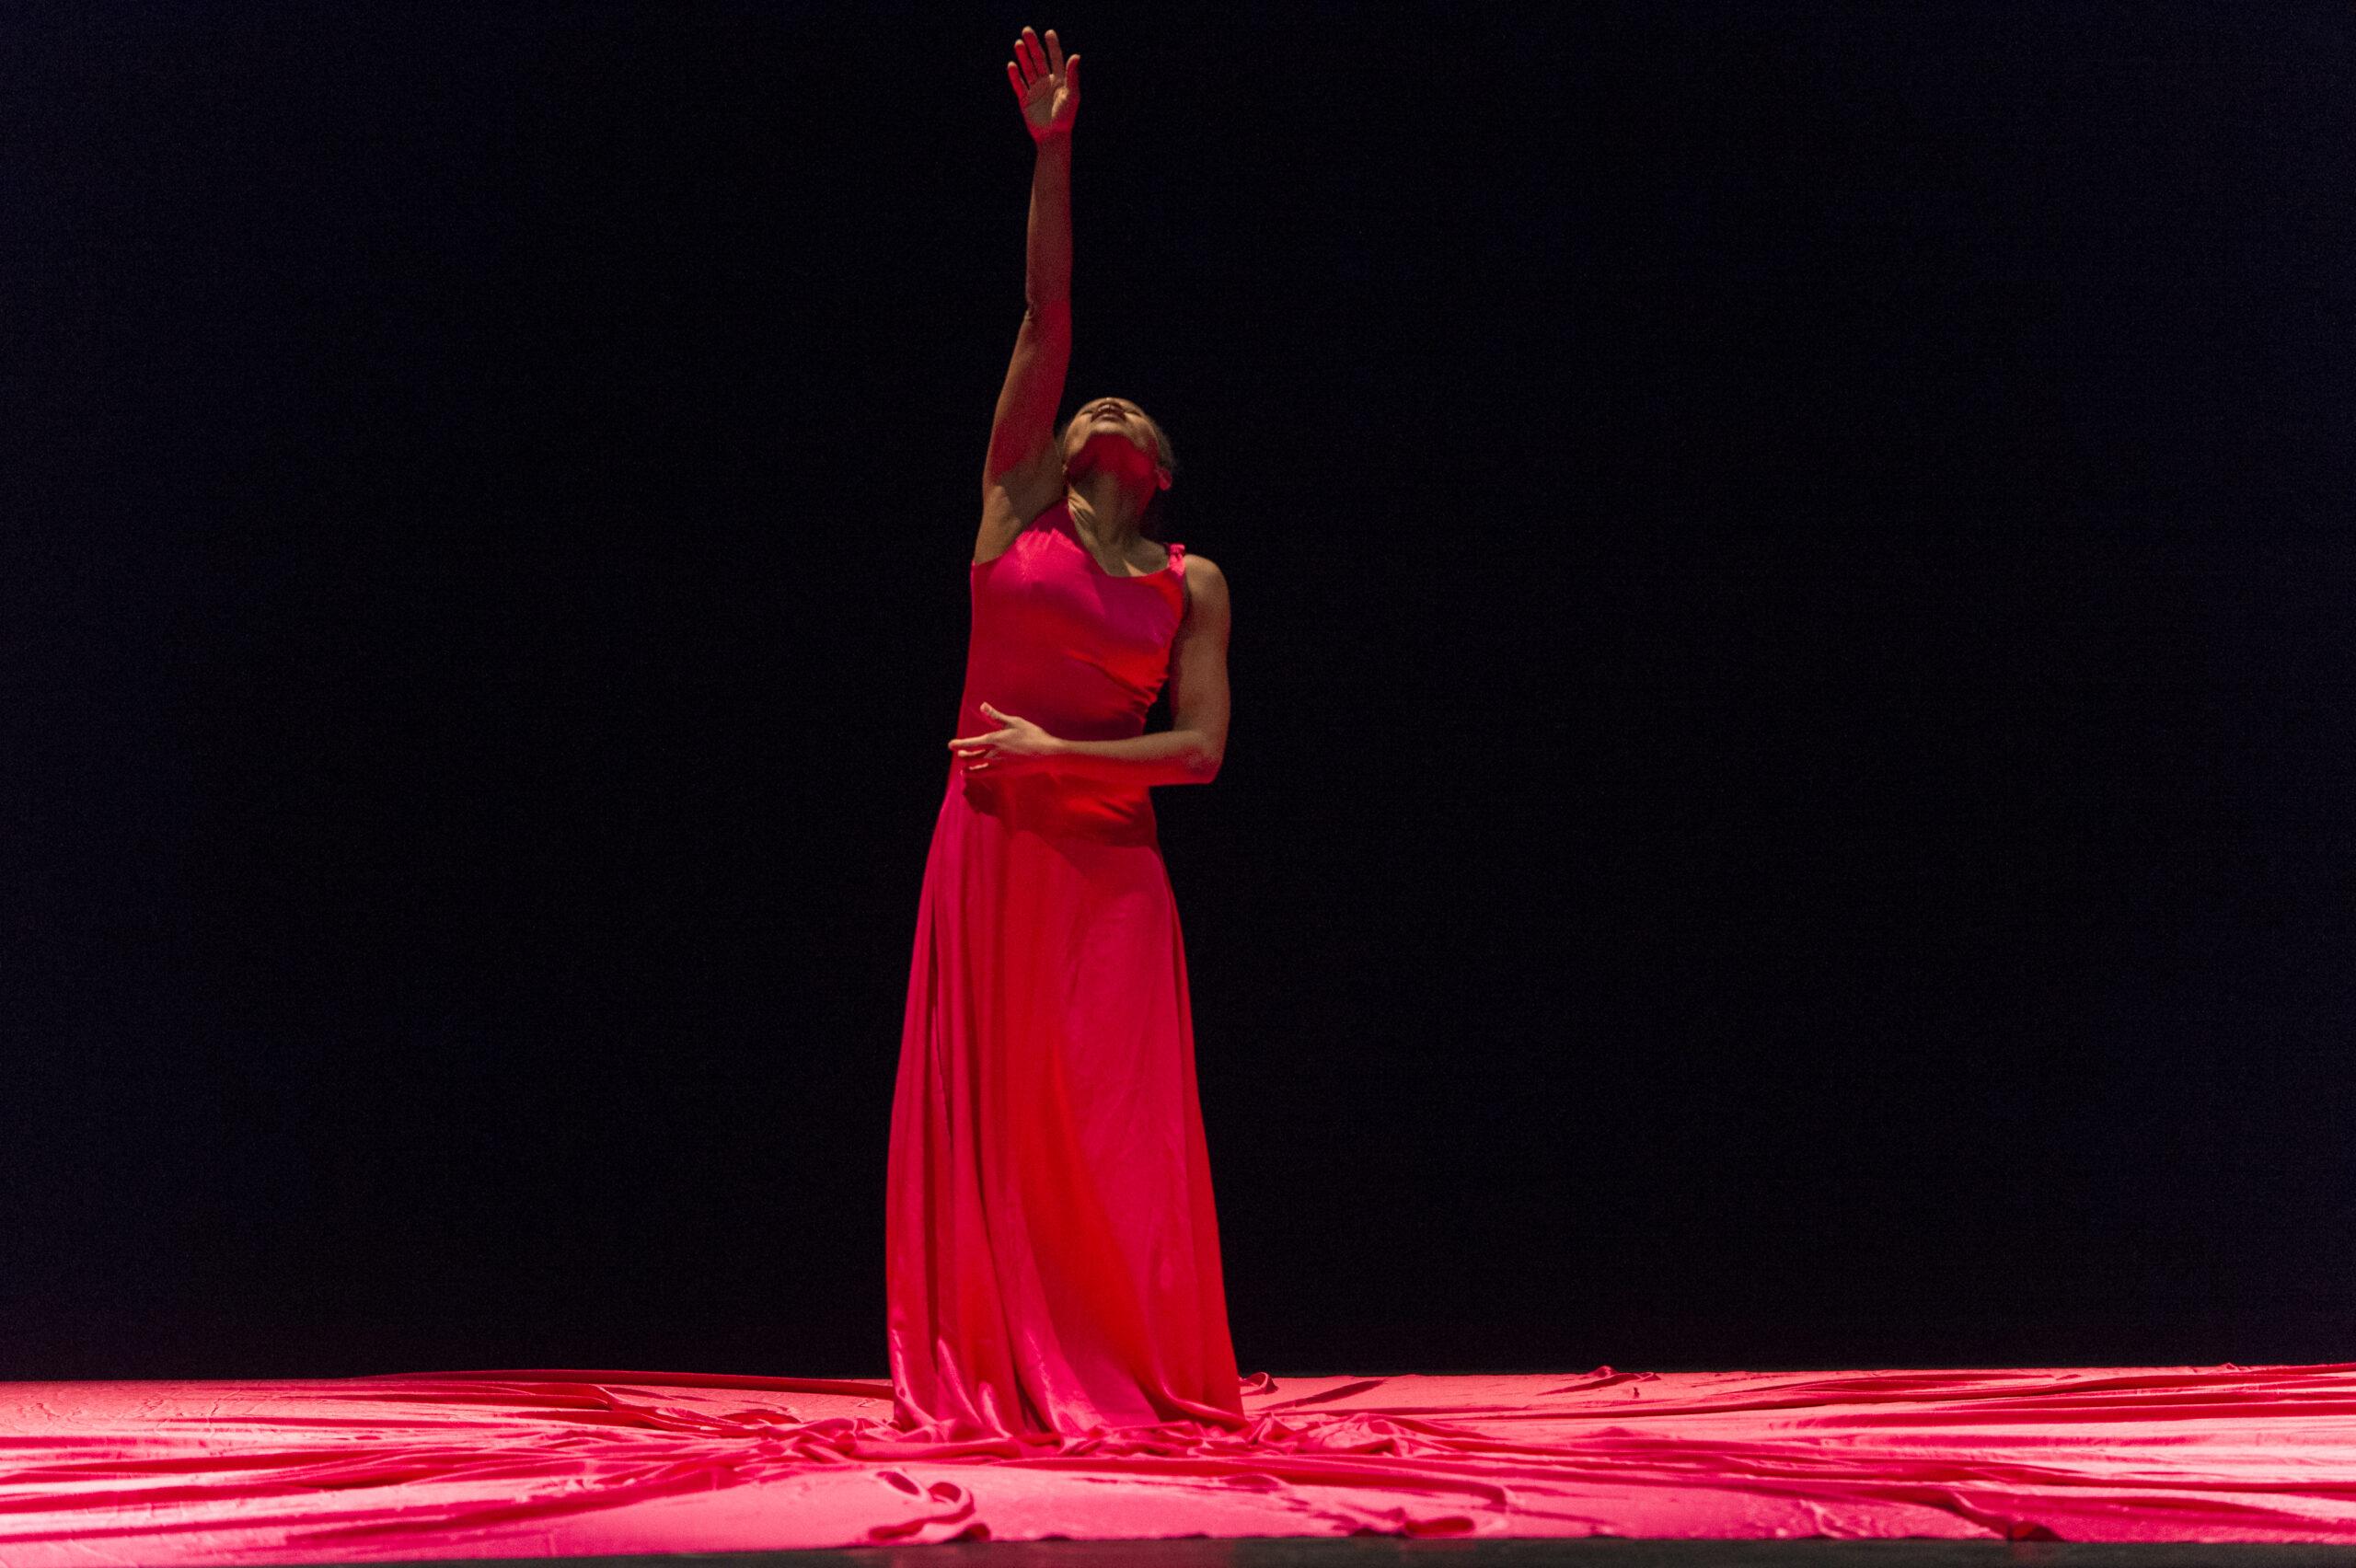 Choreographie Dreamlines TRILHA Photos: Karl-Heinz Krauskopf